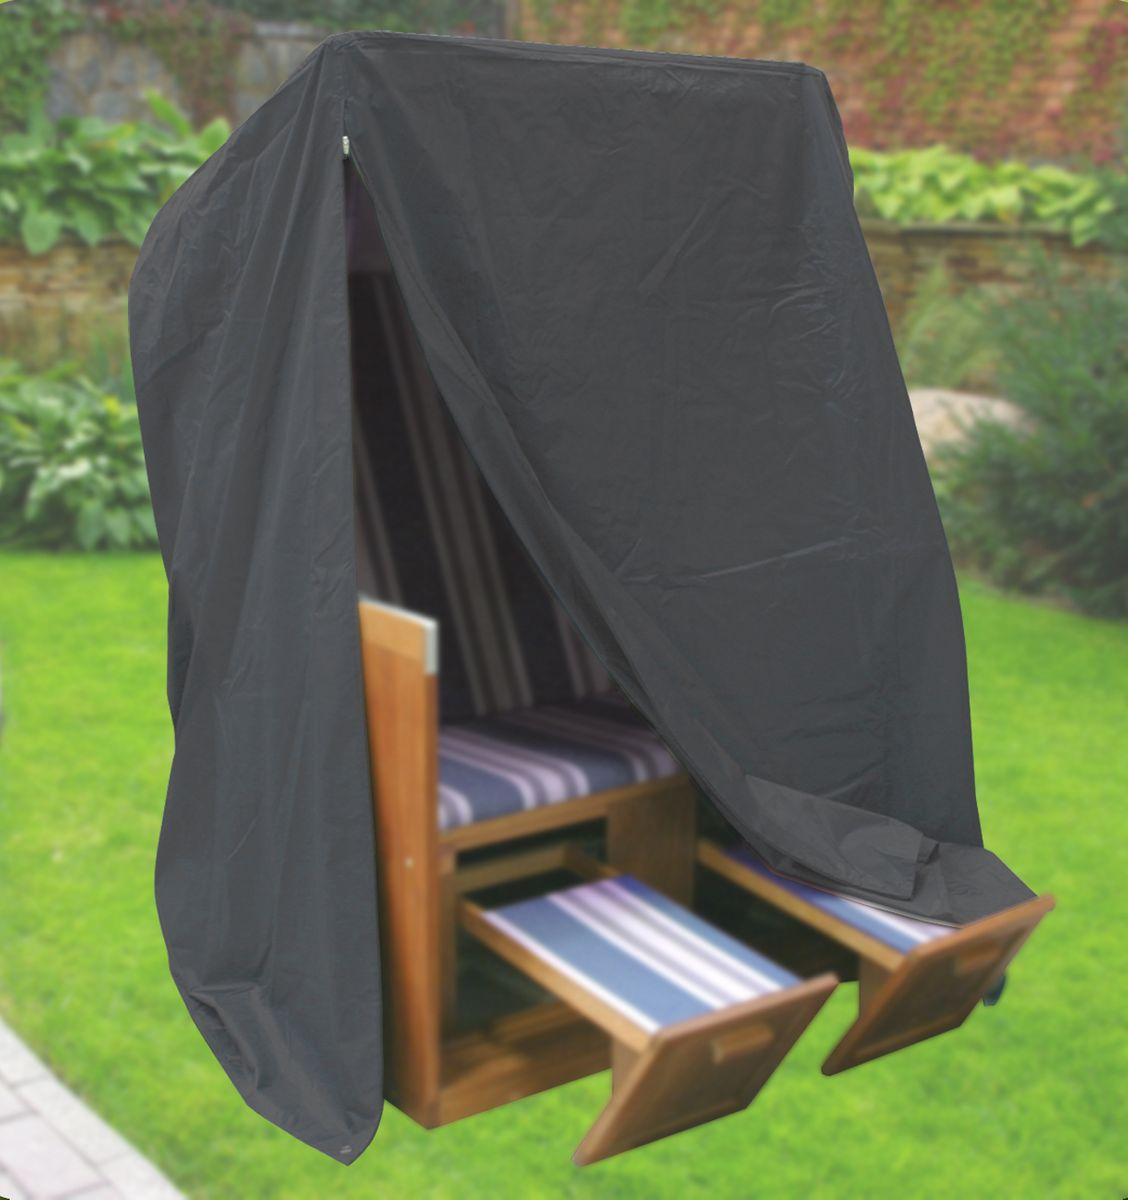 komfort schutzh lle xxl abdeckung f r strandkorb. Black Bedroom Furniture Sets. Home Design Ideas